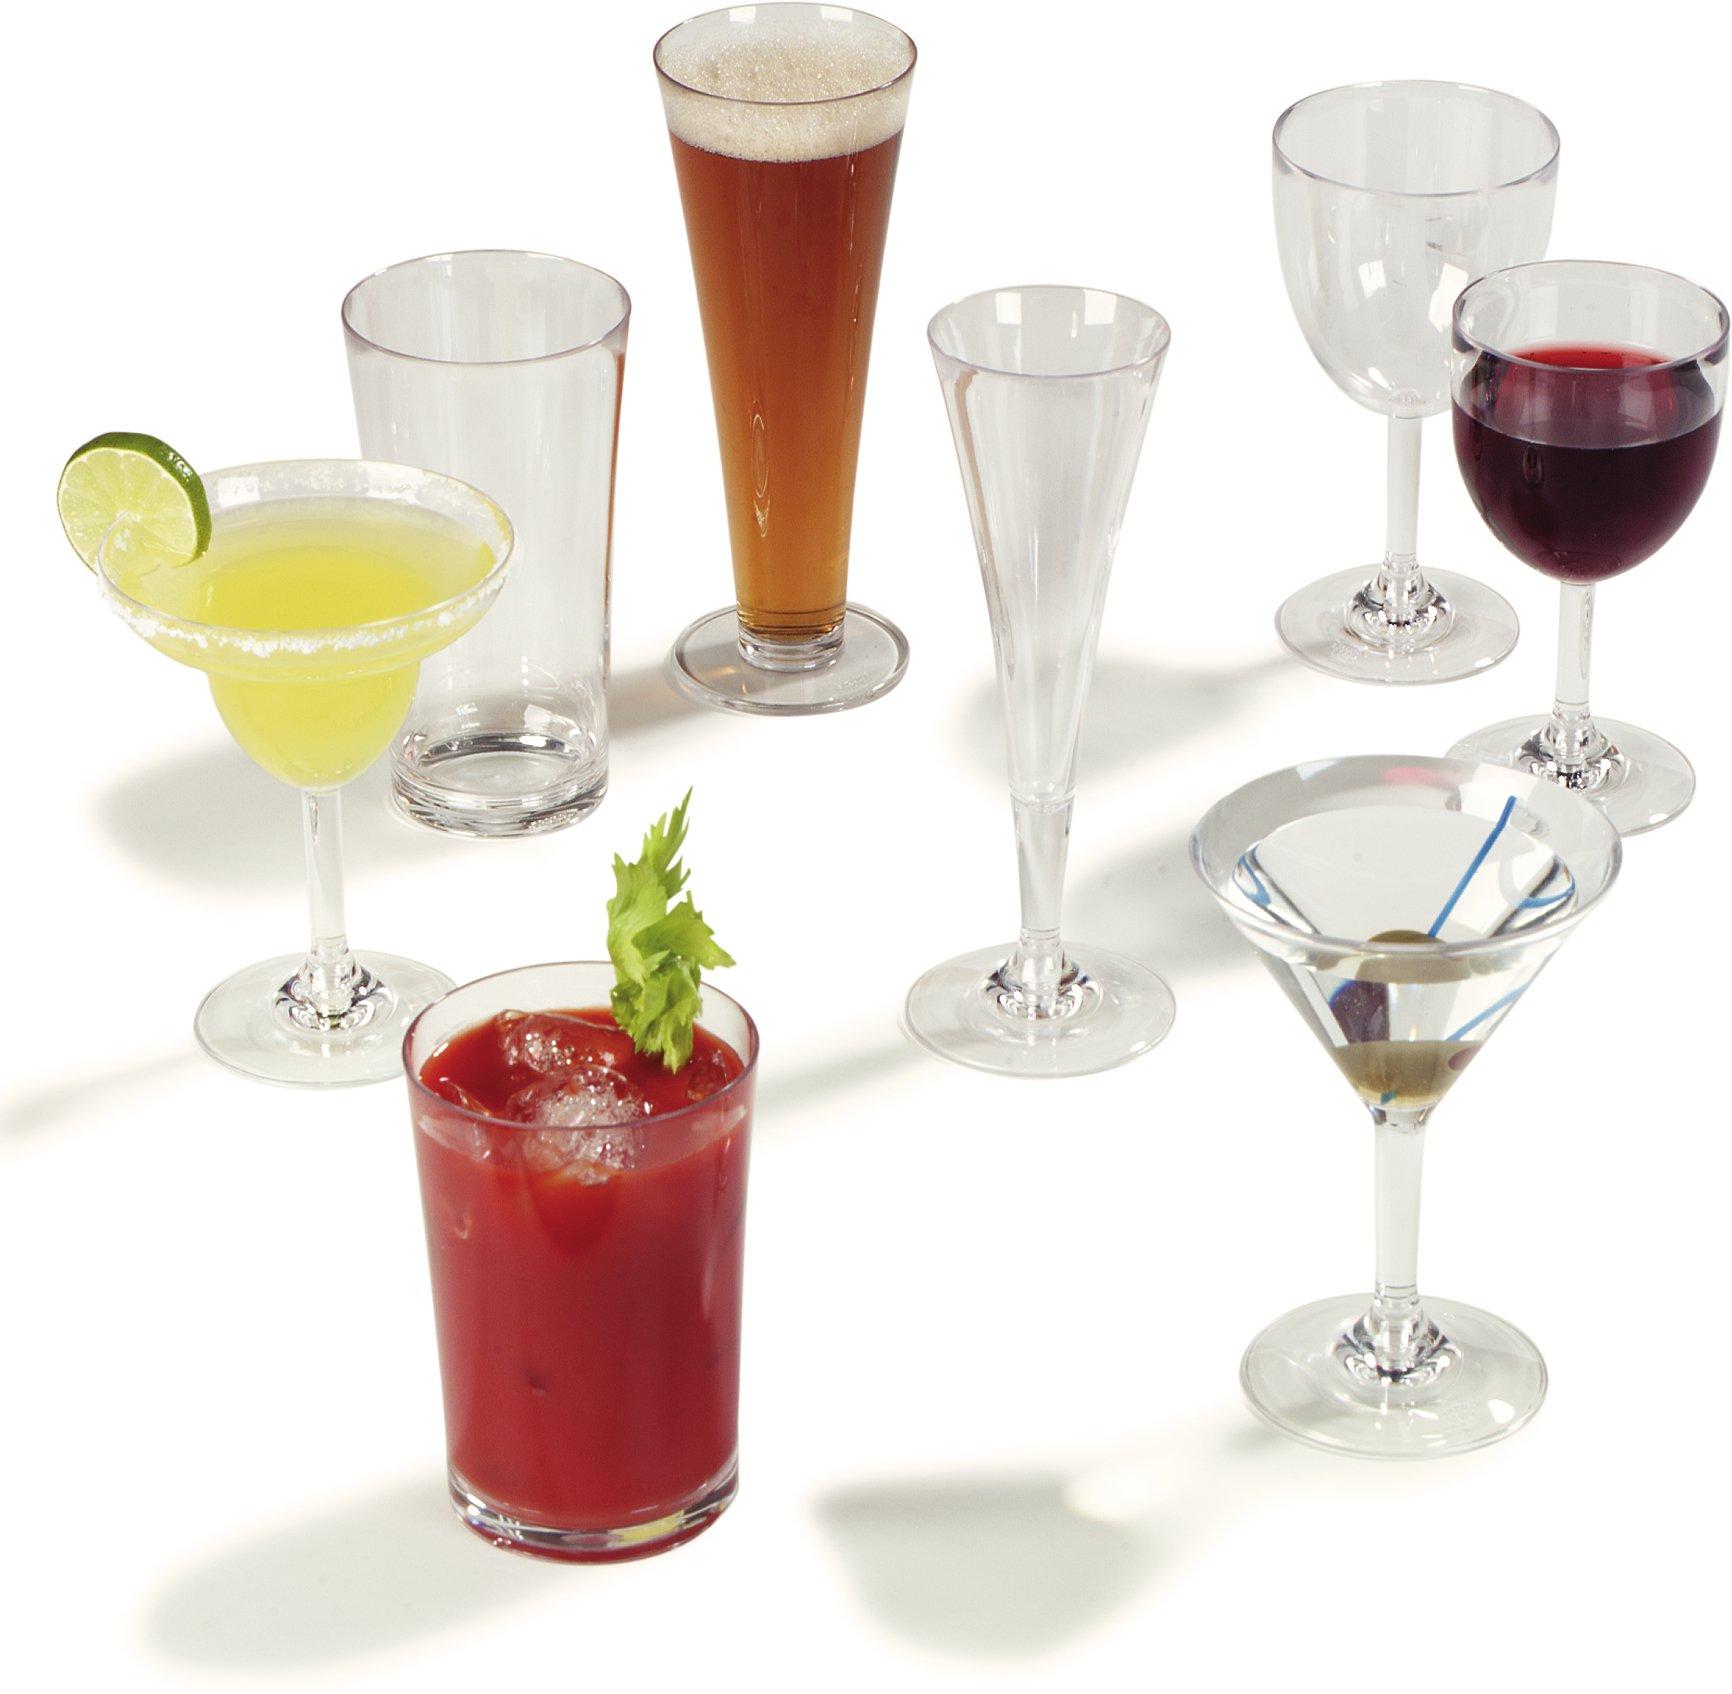 Carlisle 4362707 Liberty Polycarbonate Martini Glass, 8-oz. Capacity, Clear (Case of 24) by Carlisle (Image #6)